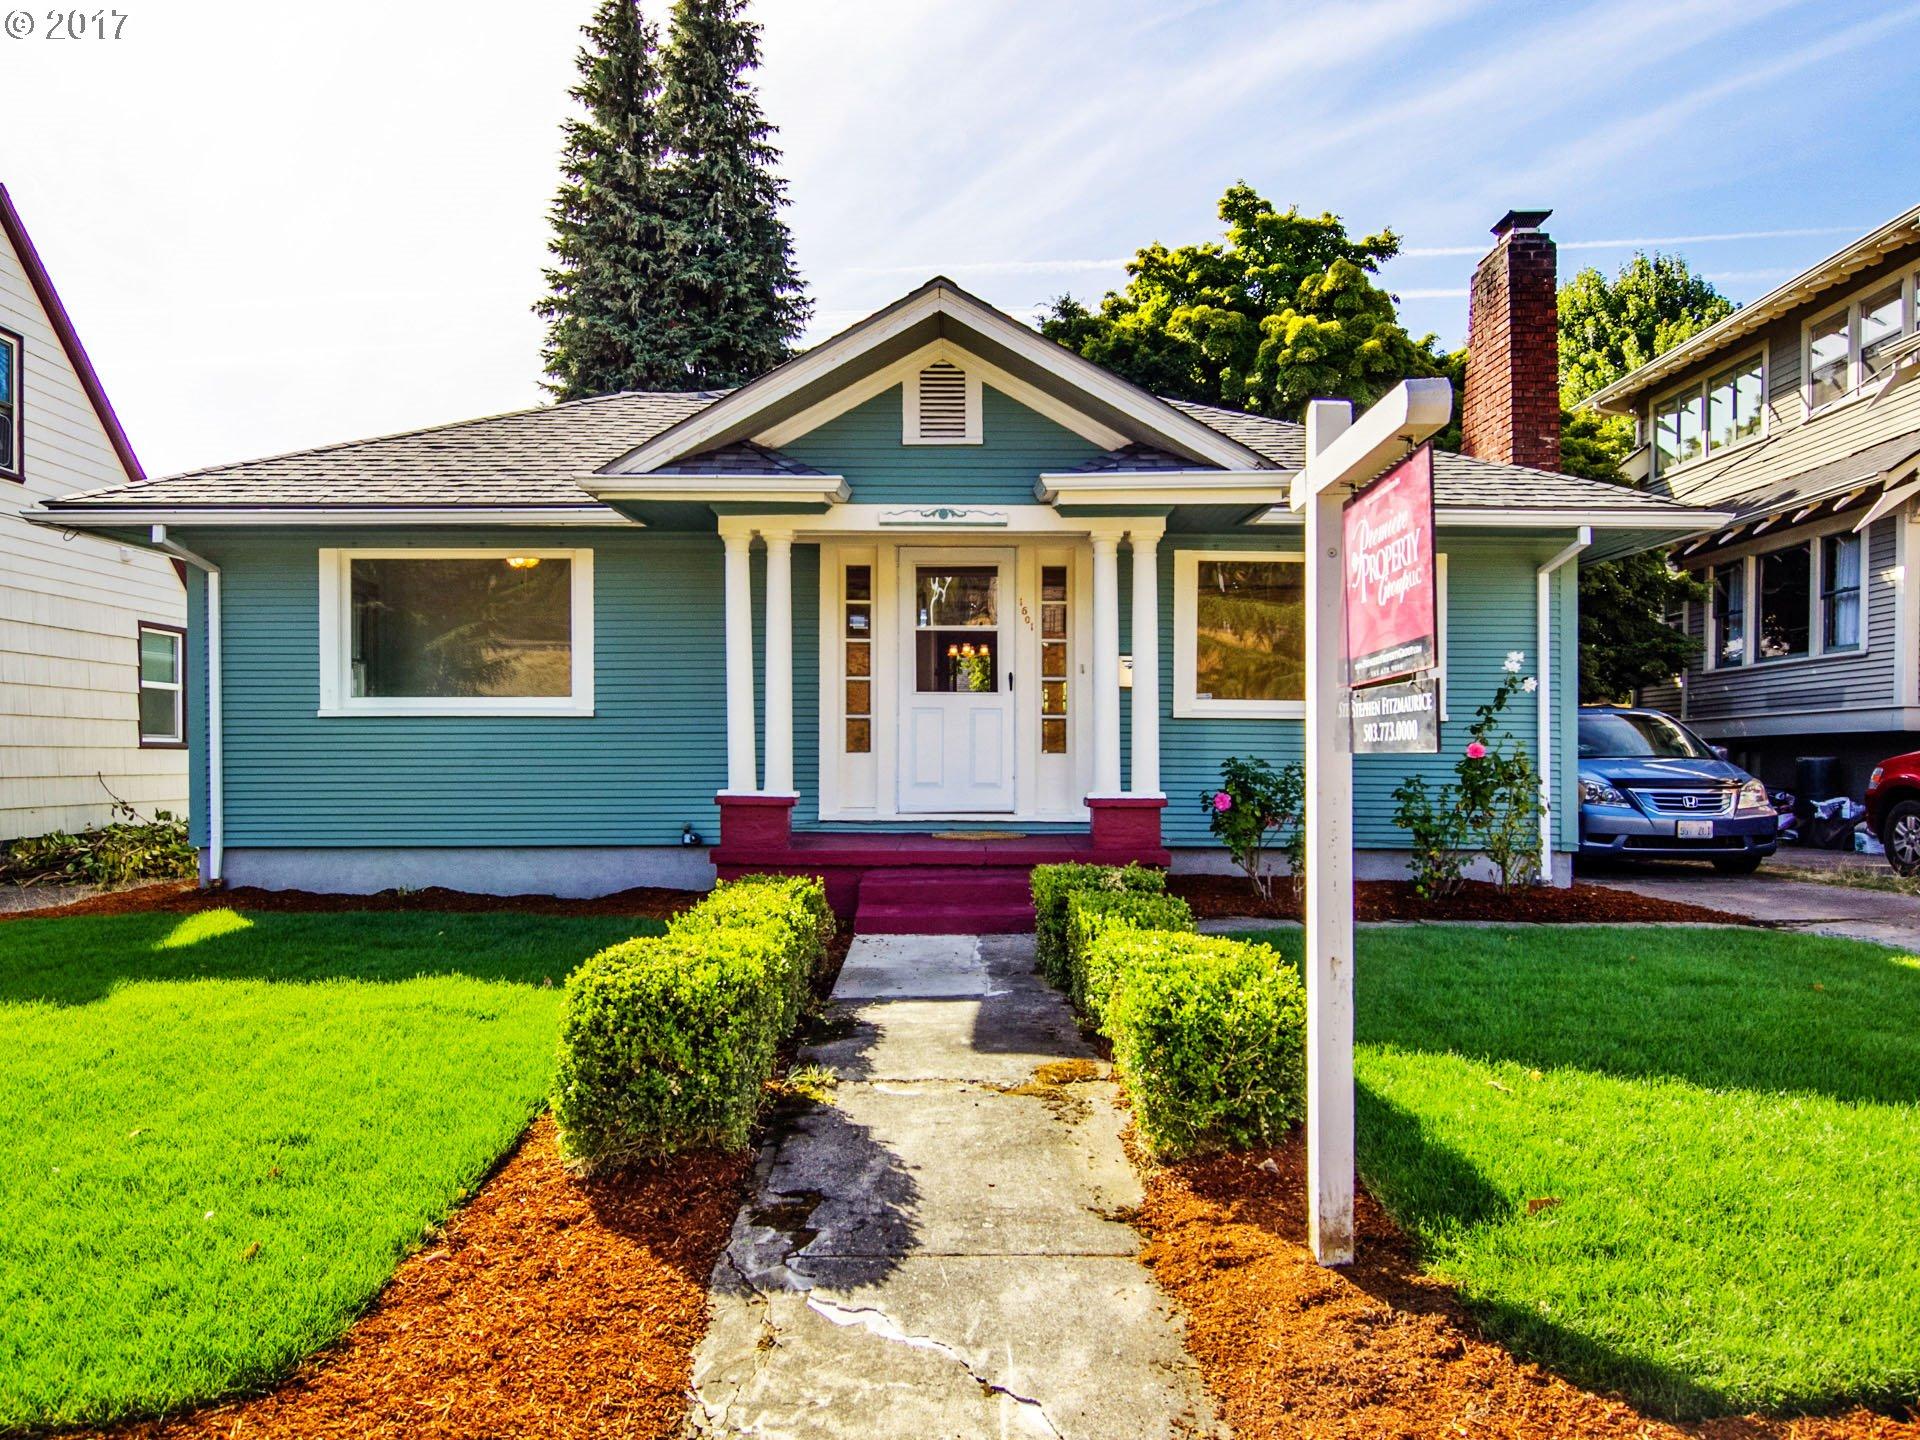 1601 SE 60TH AVE, Portland OR 97215